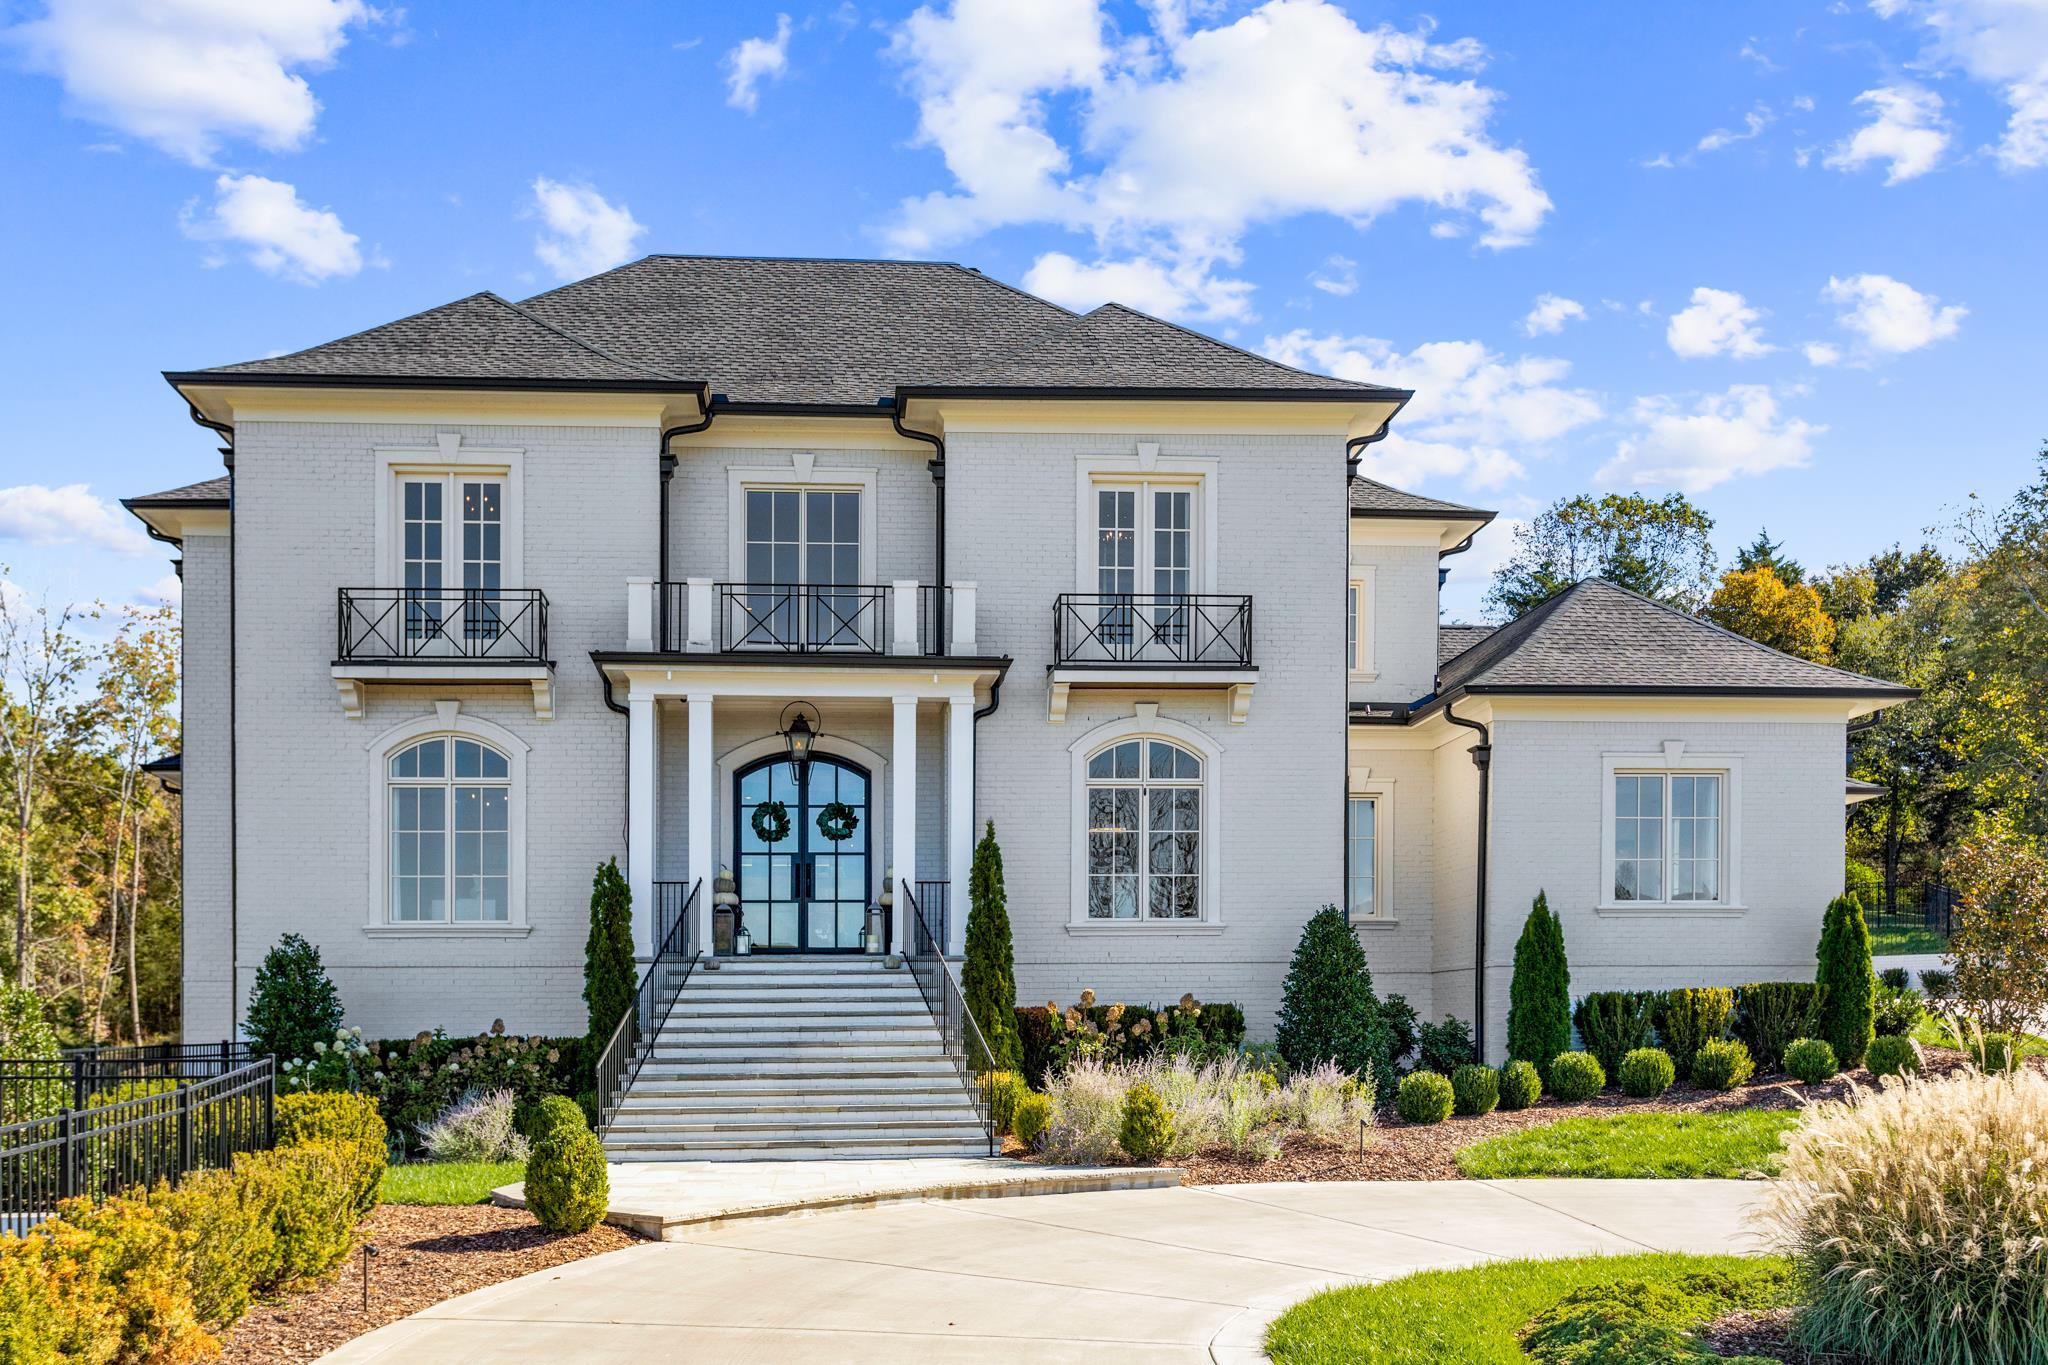 6411 Johnson Chapel Cir, Brentwood, TN 37027 - Brentwood, TN real estate listing